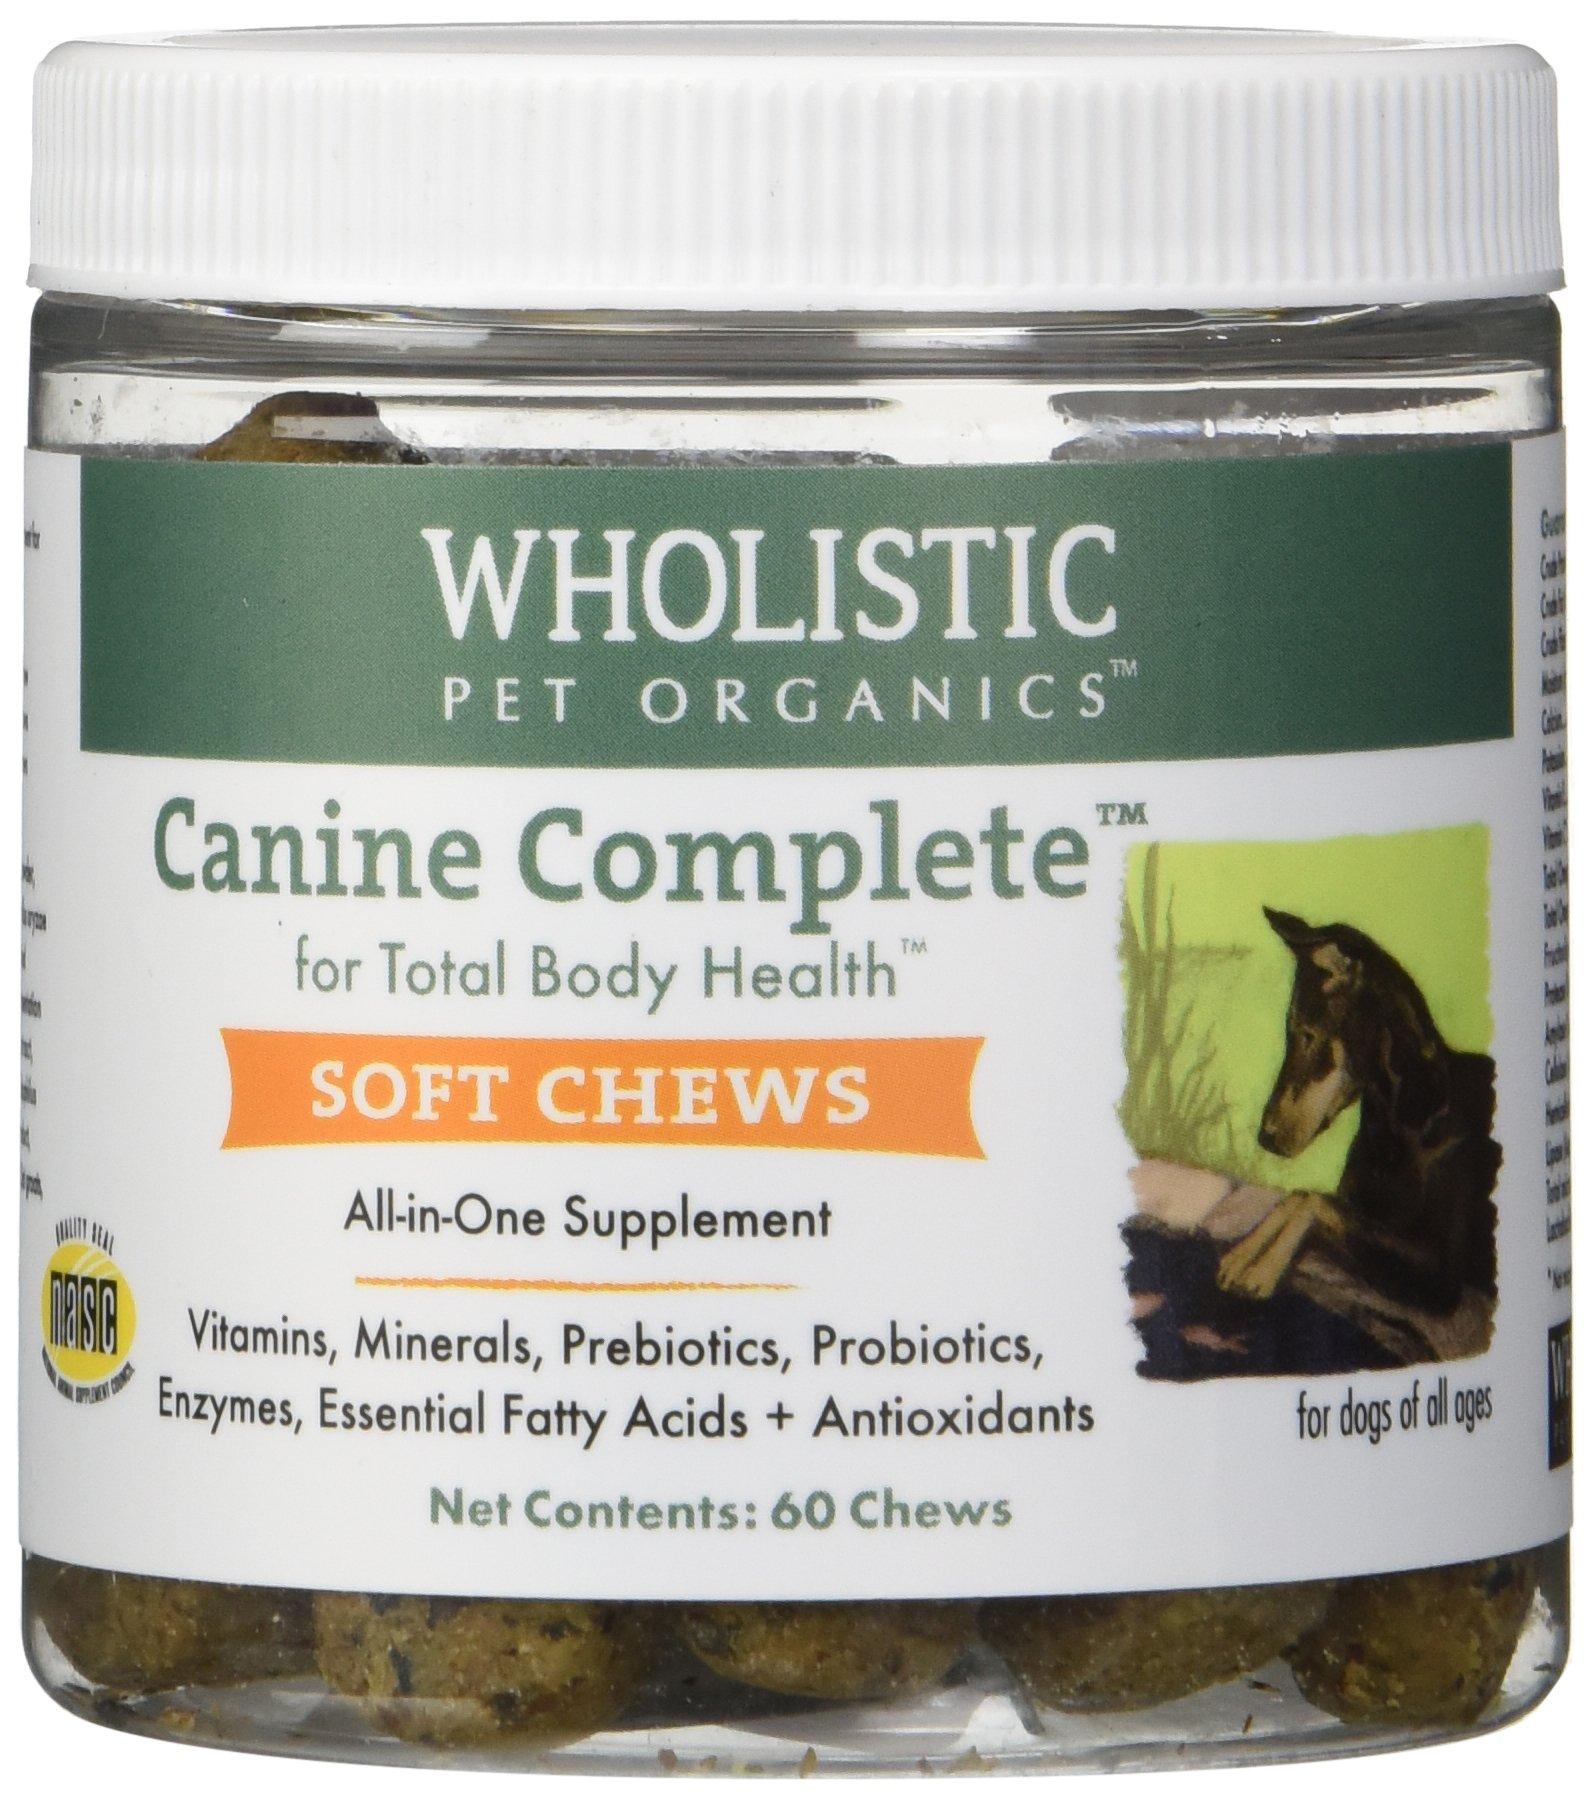 Wholistic Pet Organics 60 Count Canine Complete Soft Chews Supplement